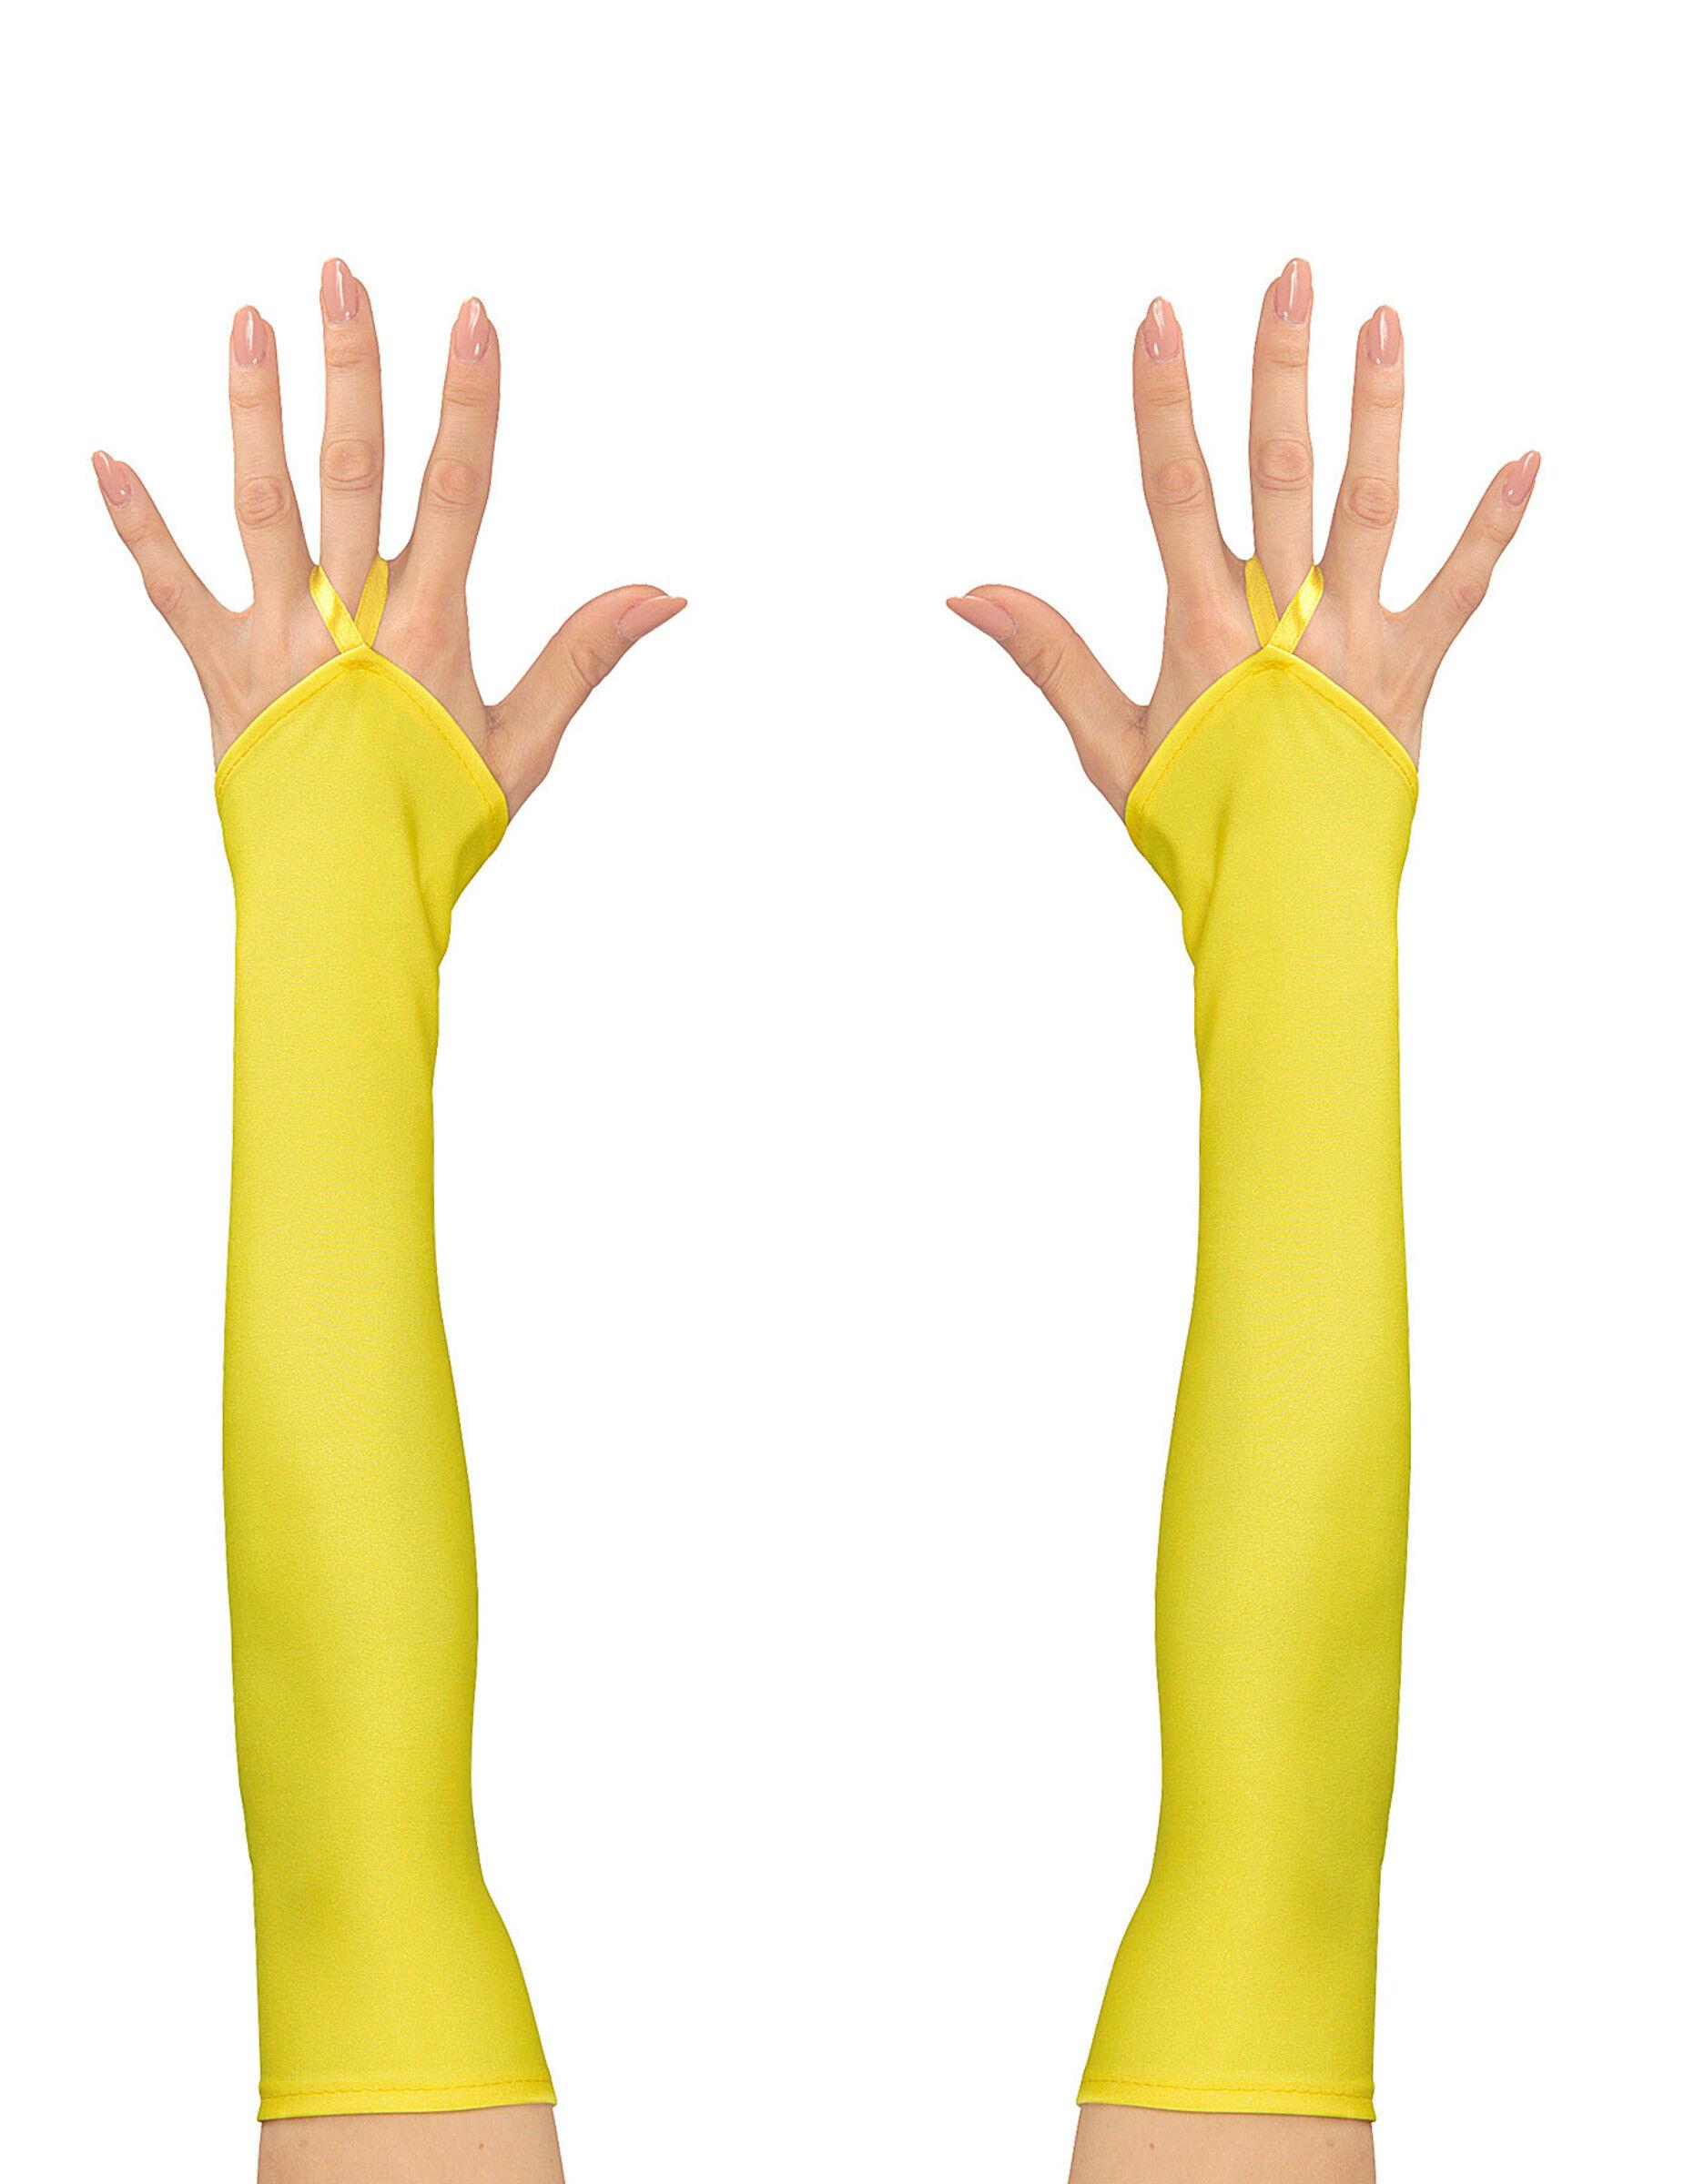 Vegaoo.es Mitones largos amarillo fluorescente mujer